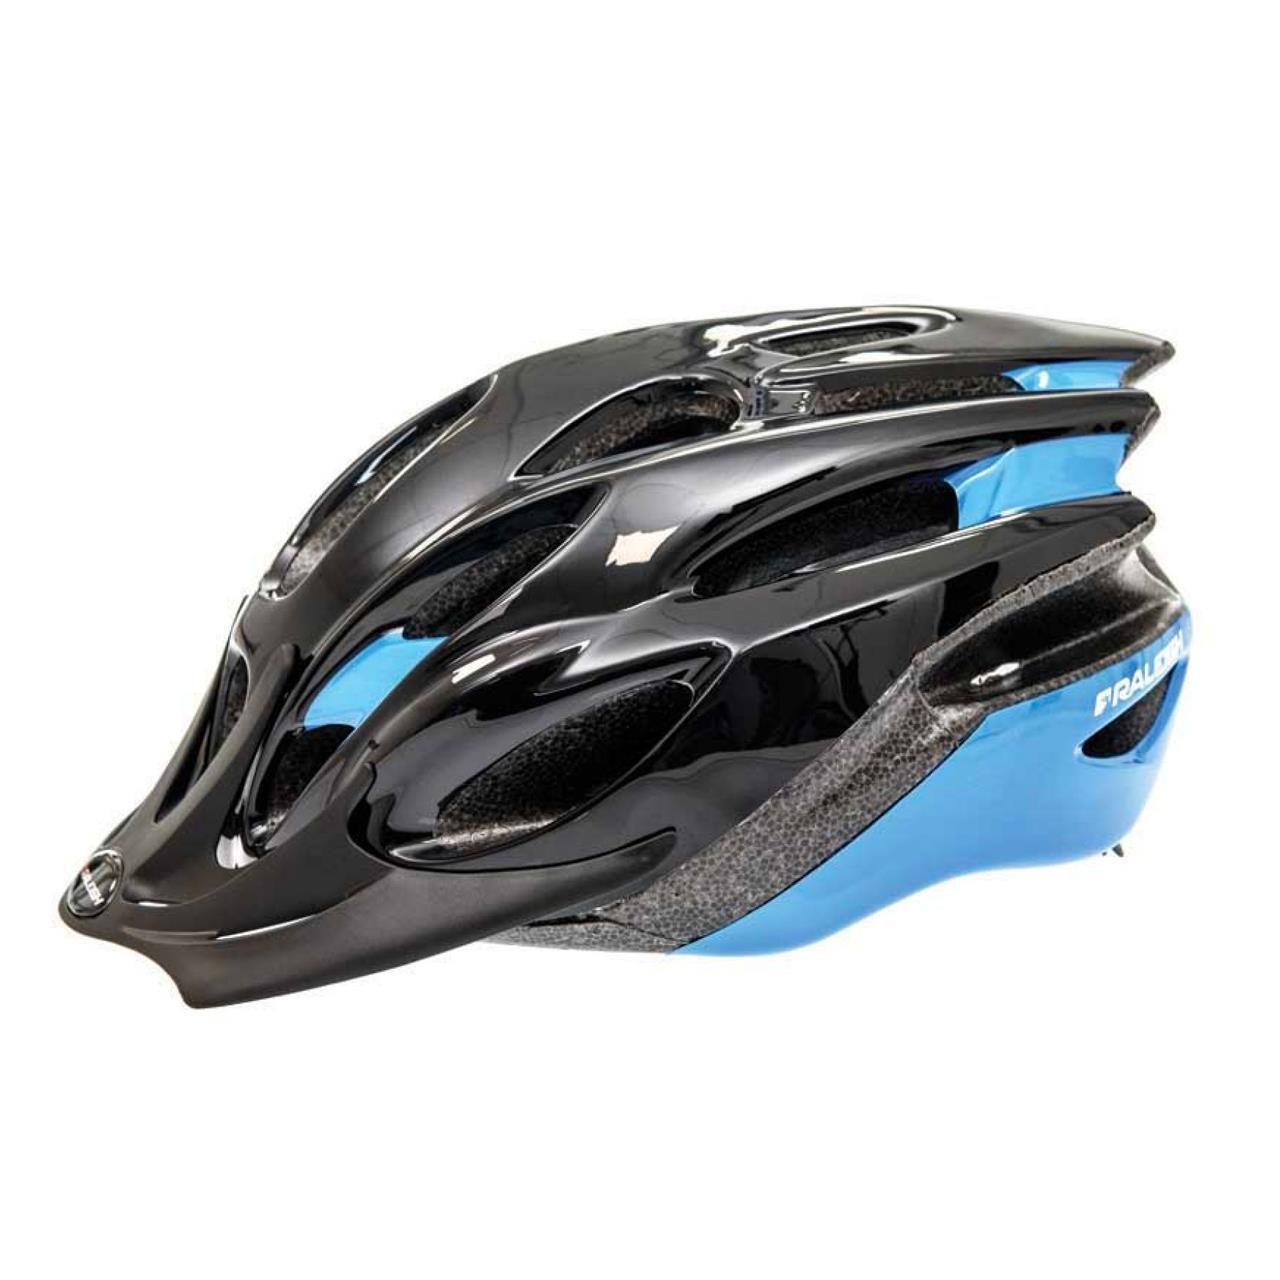 Raleigh Mission Evo Cycle Helmet